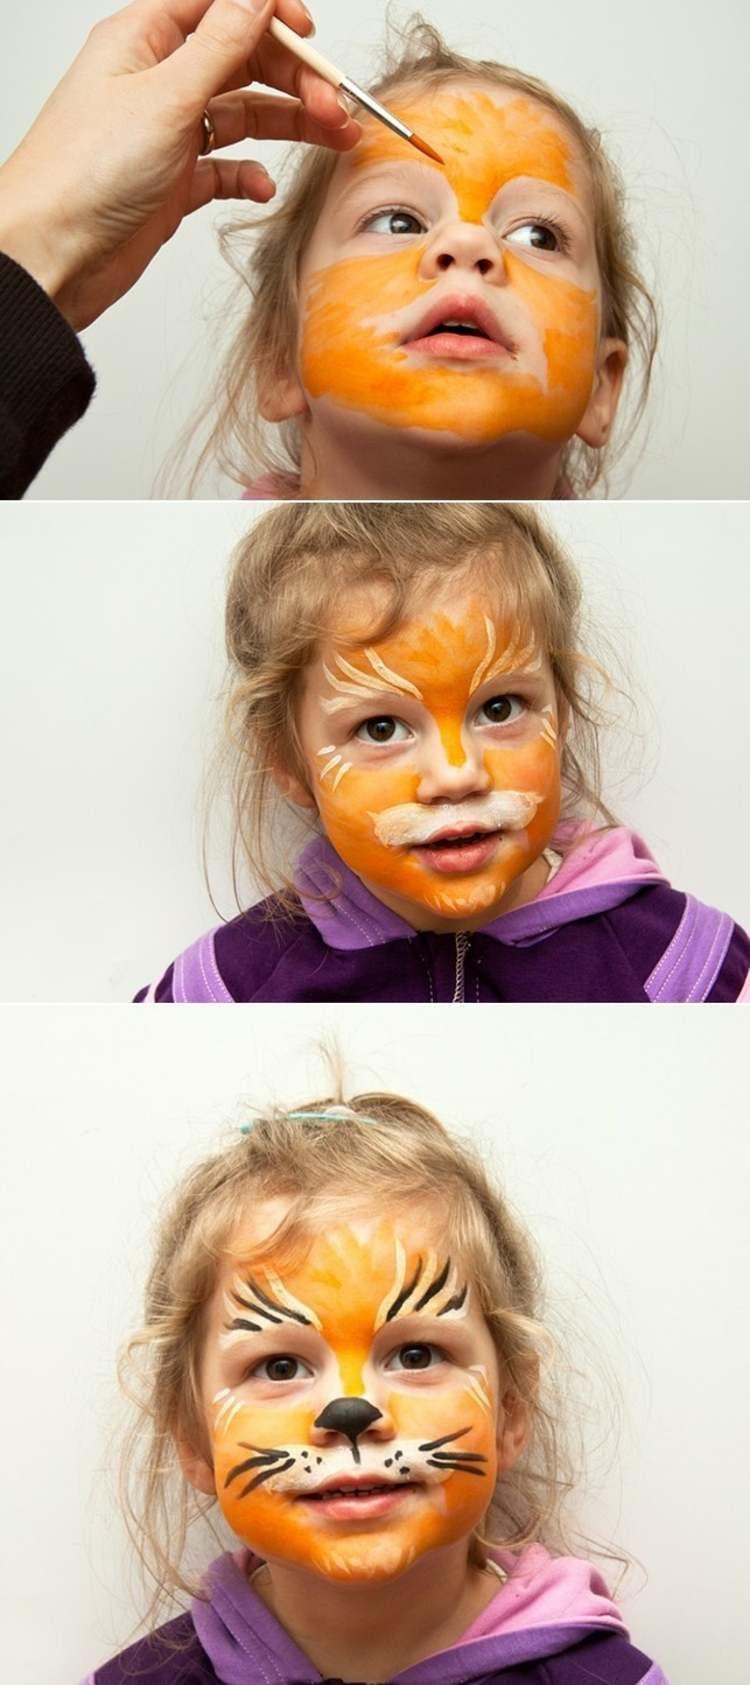 maquillage halloween enfant id es pour vos petits monstres maquillage enfant maquillage. Black Bedroom Furniture Sets. Home Design Ideas